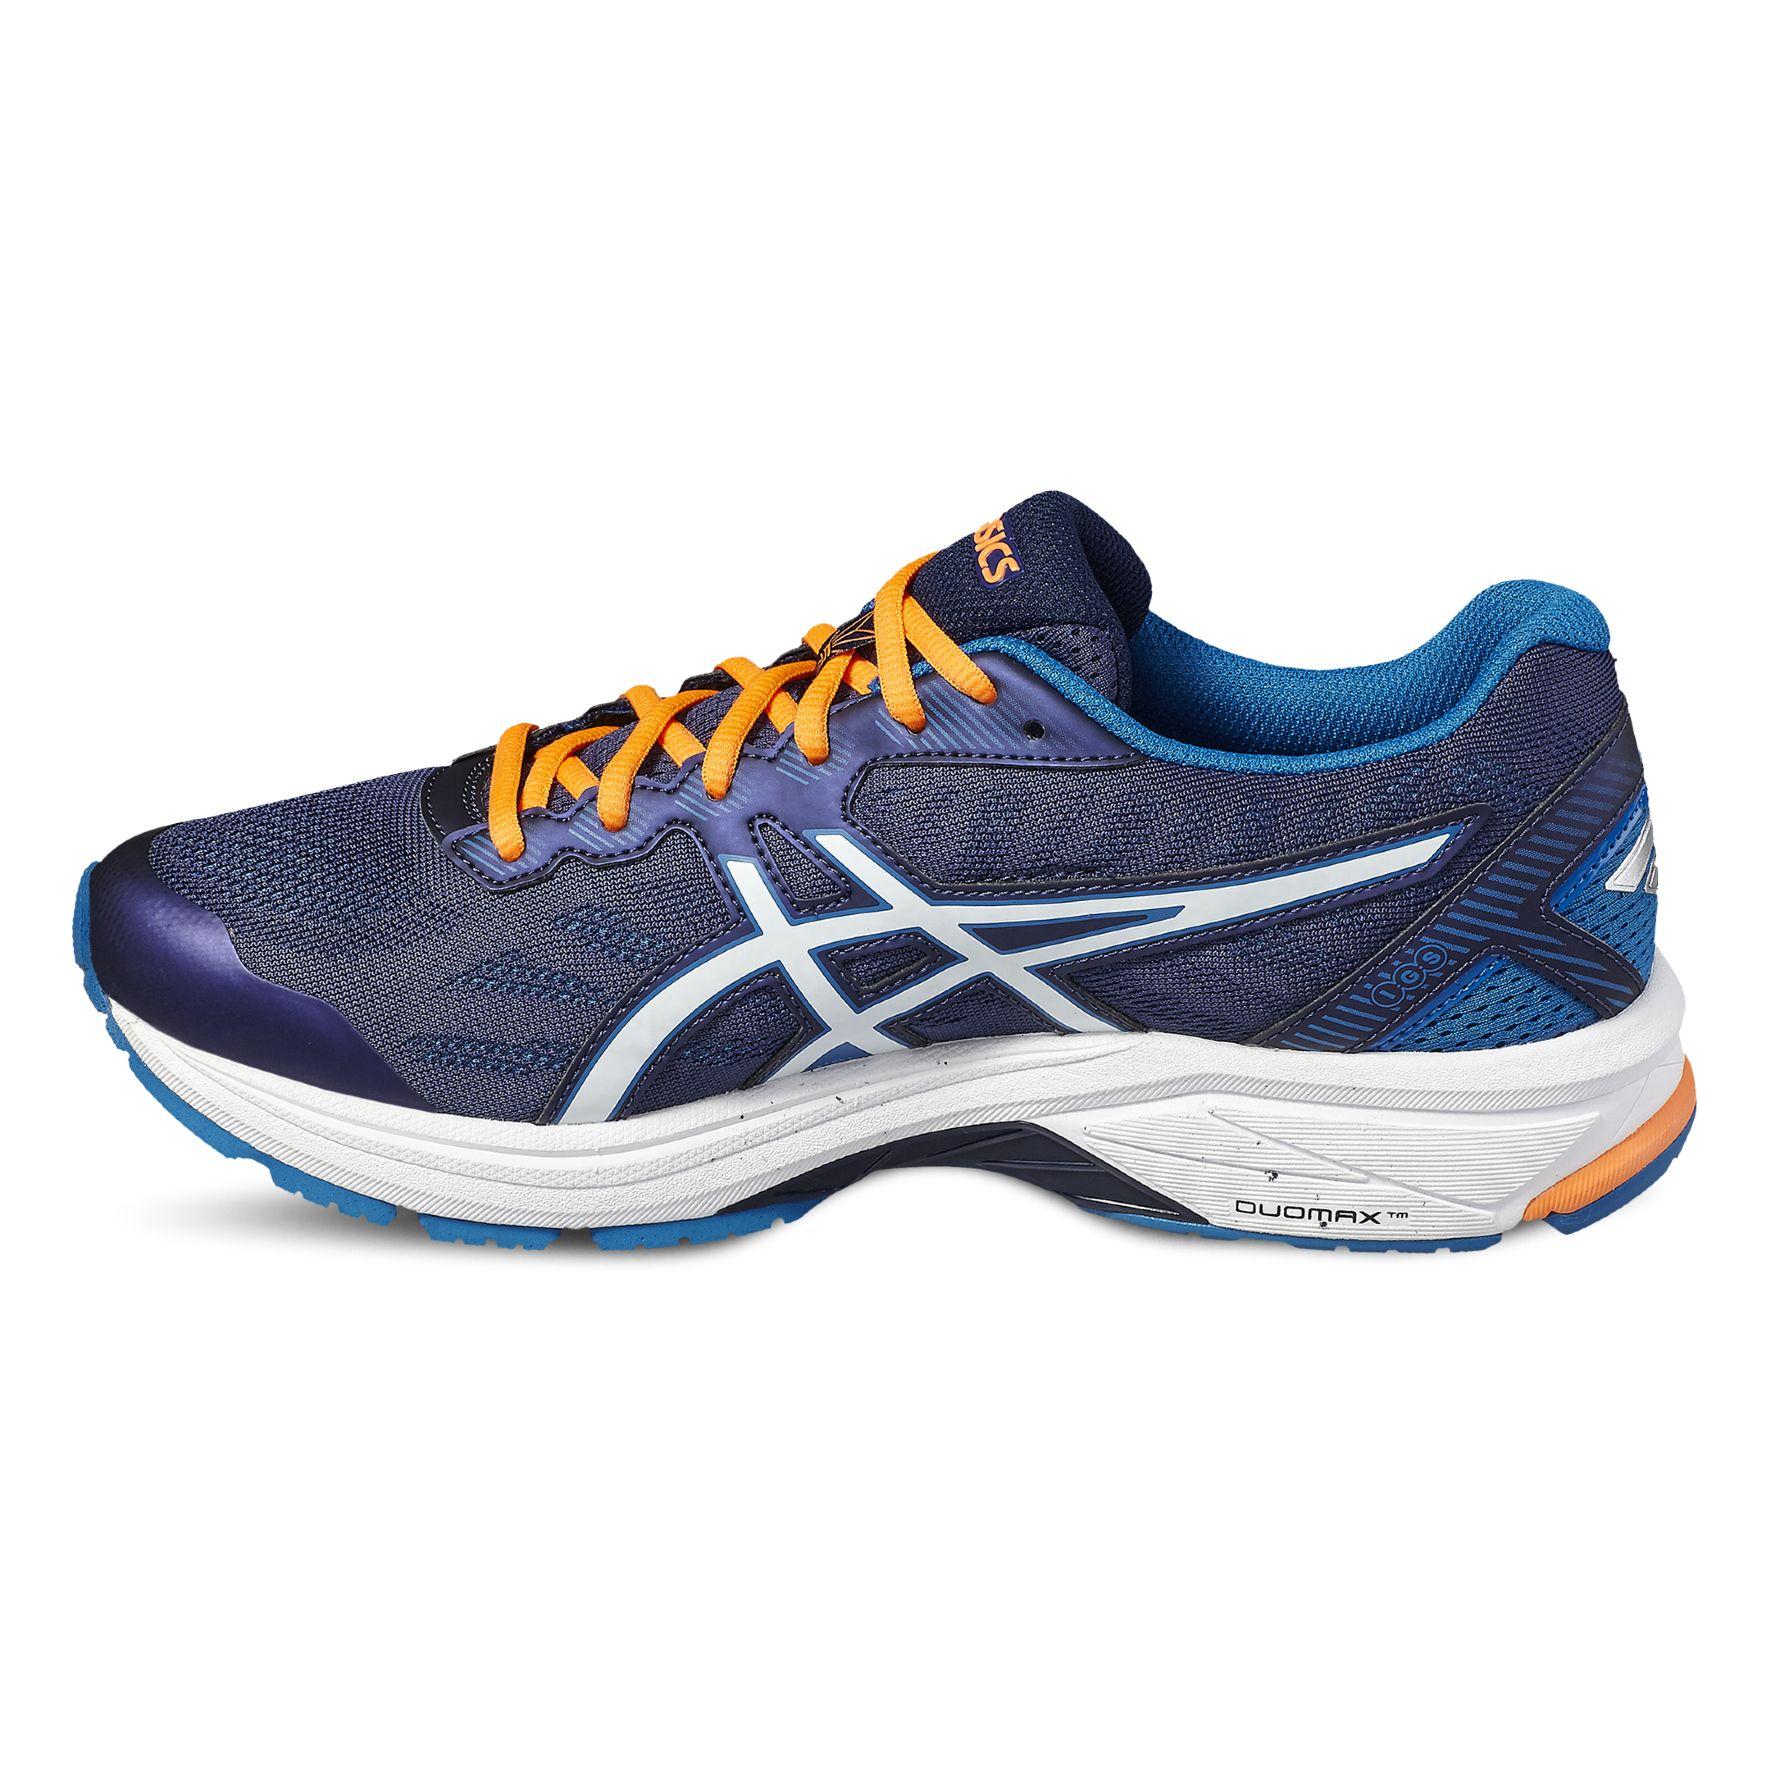 Asics GT-1000 5 Mens Running Shoes - Sweatband.com